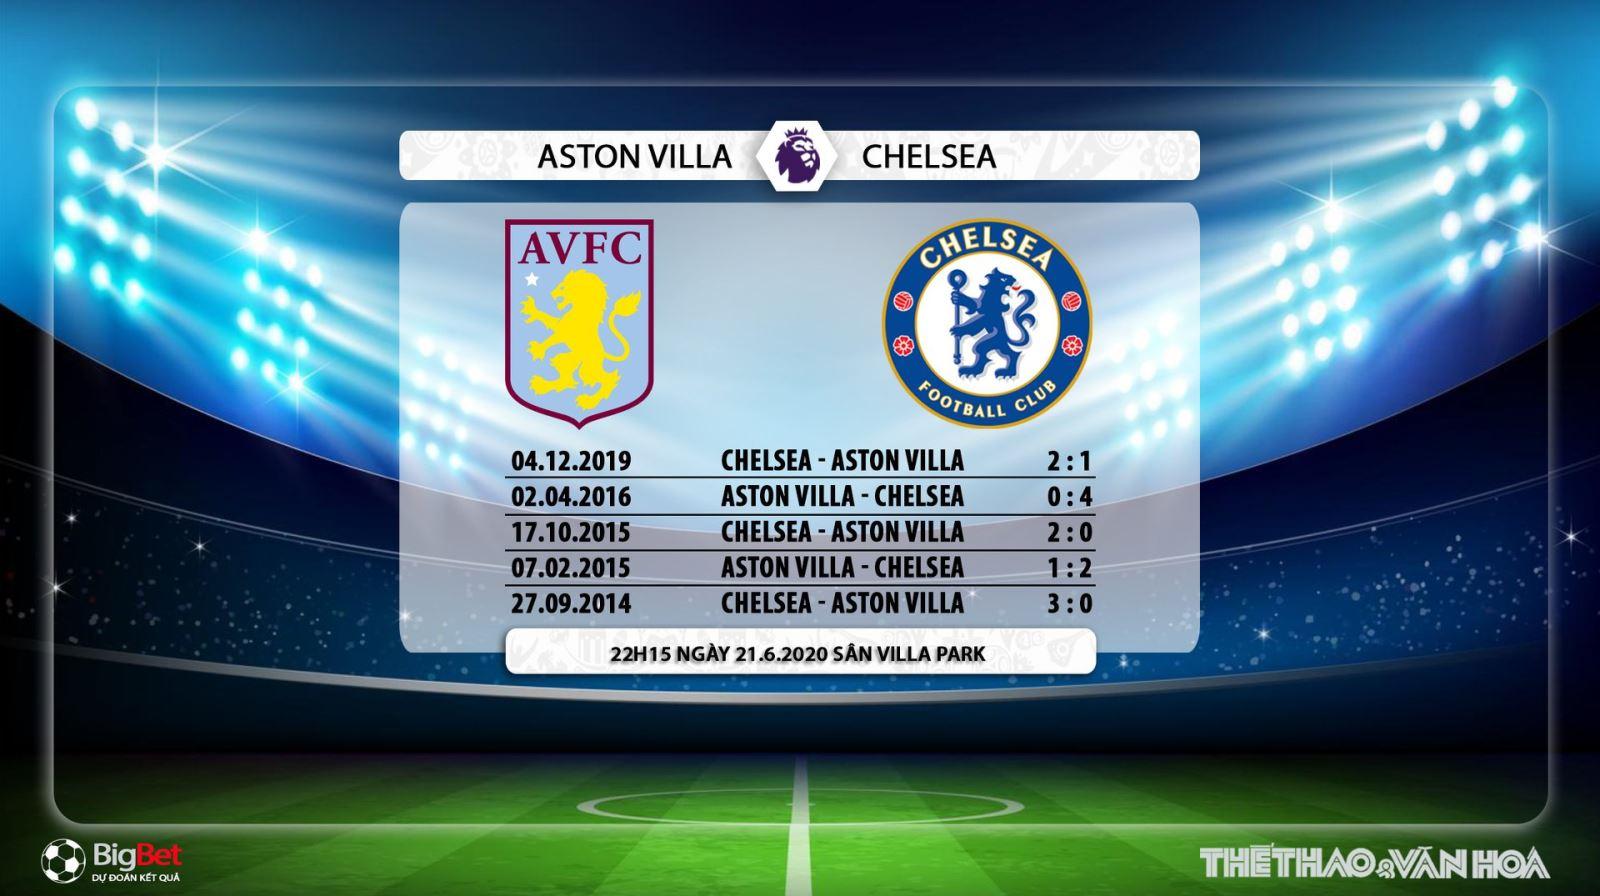 bóng đá, bong da anh, chelsea, aston villa, aston villa vs chelsea, trực tiếp bóng đá, ngoại hạng anh, xem bóng đá trực tiếp